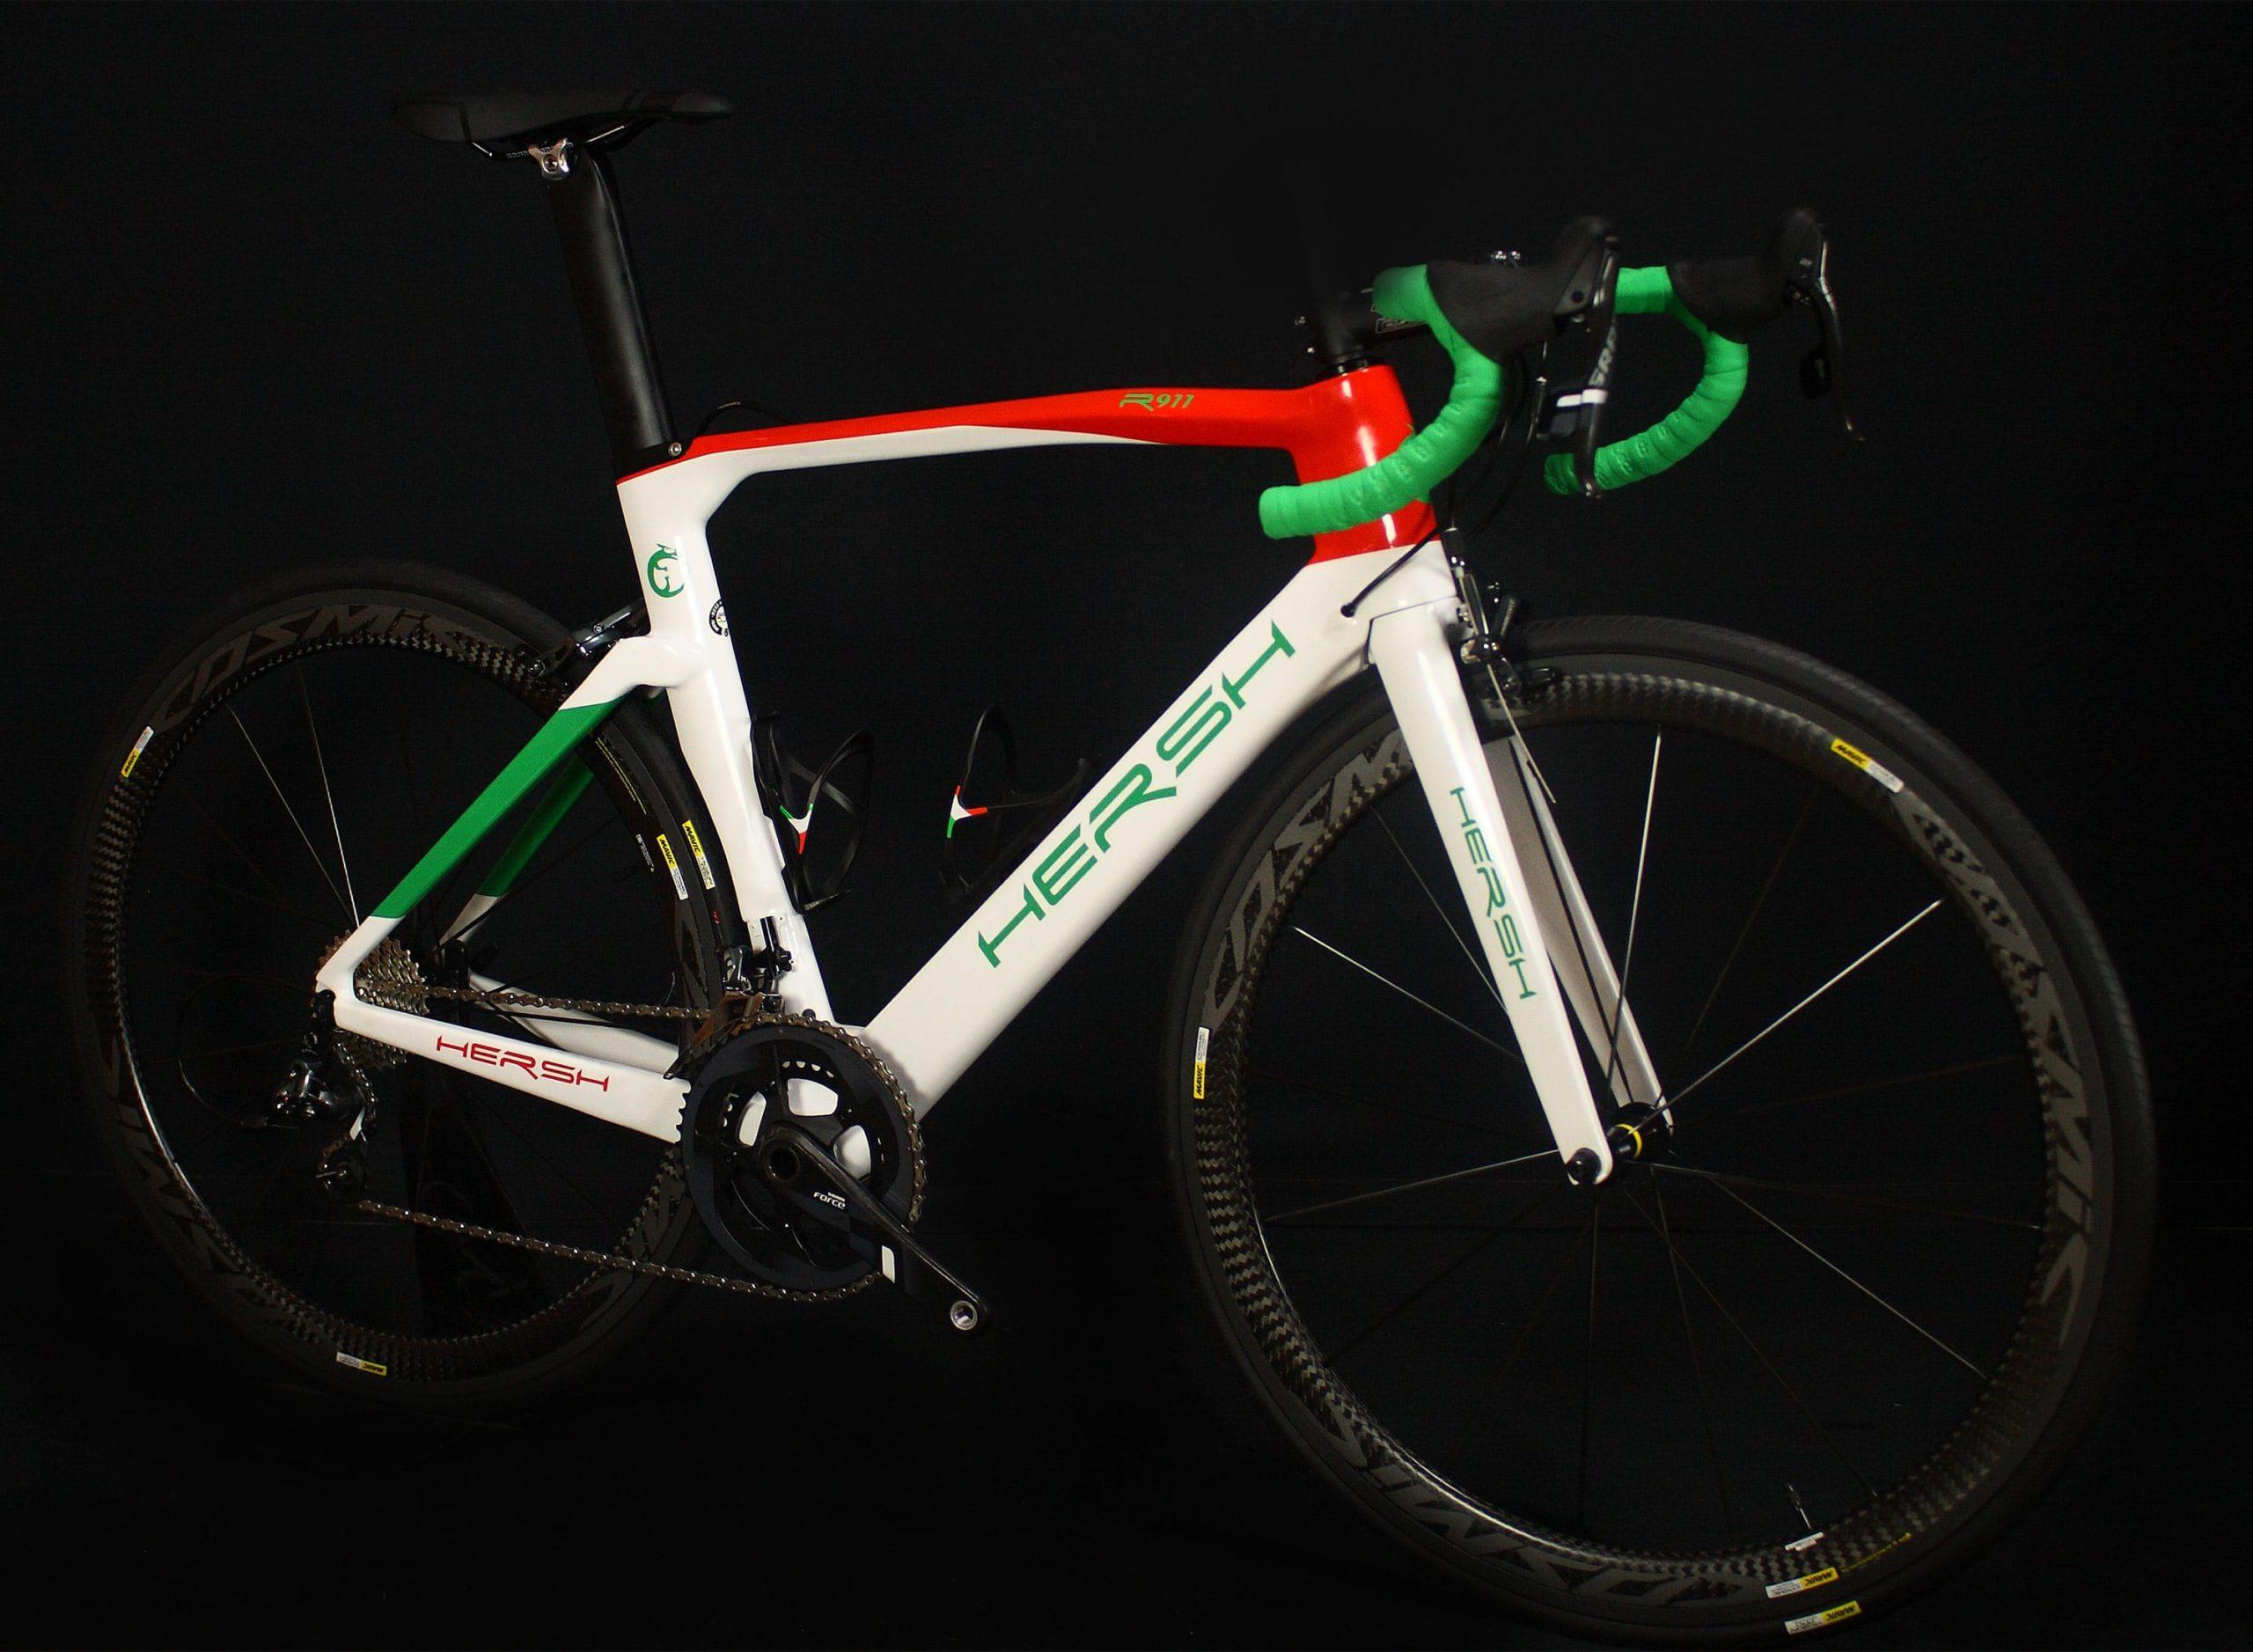 R911 Hersh carbon